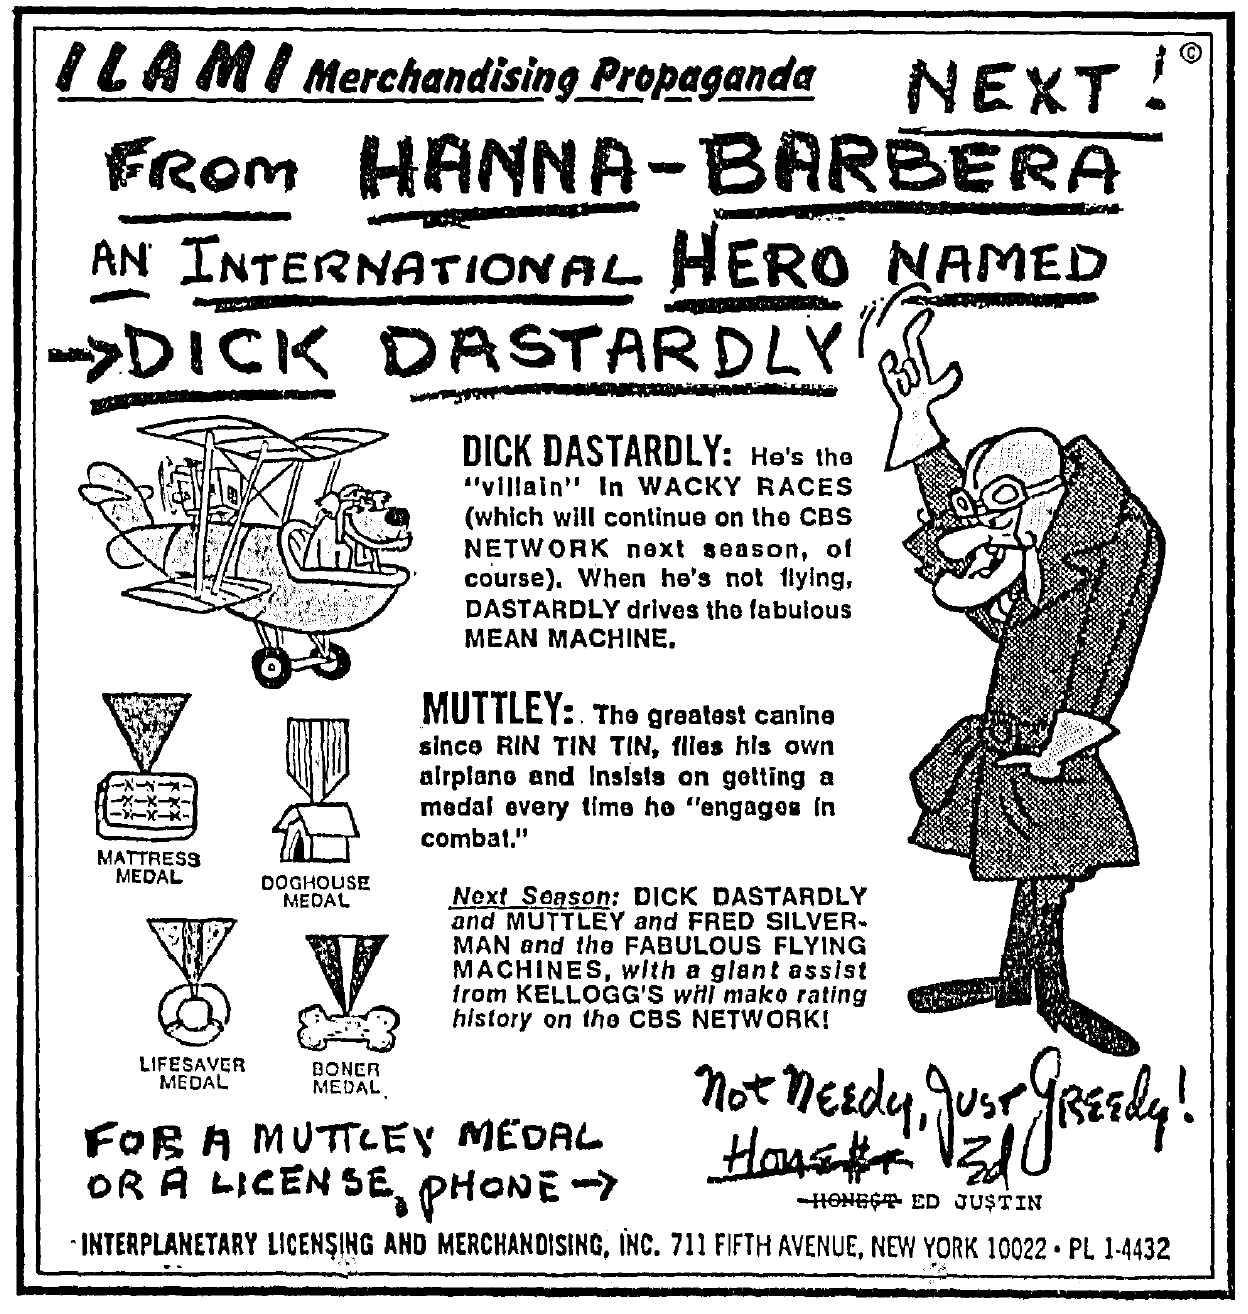 Yogi Bear Hanna-Barbera Movie//TV Character Million Dollar Novelty Money